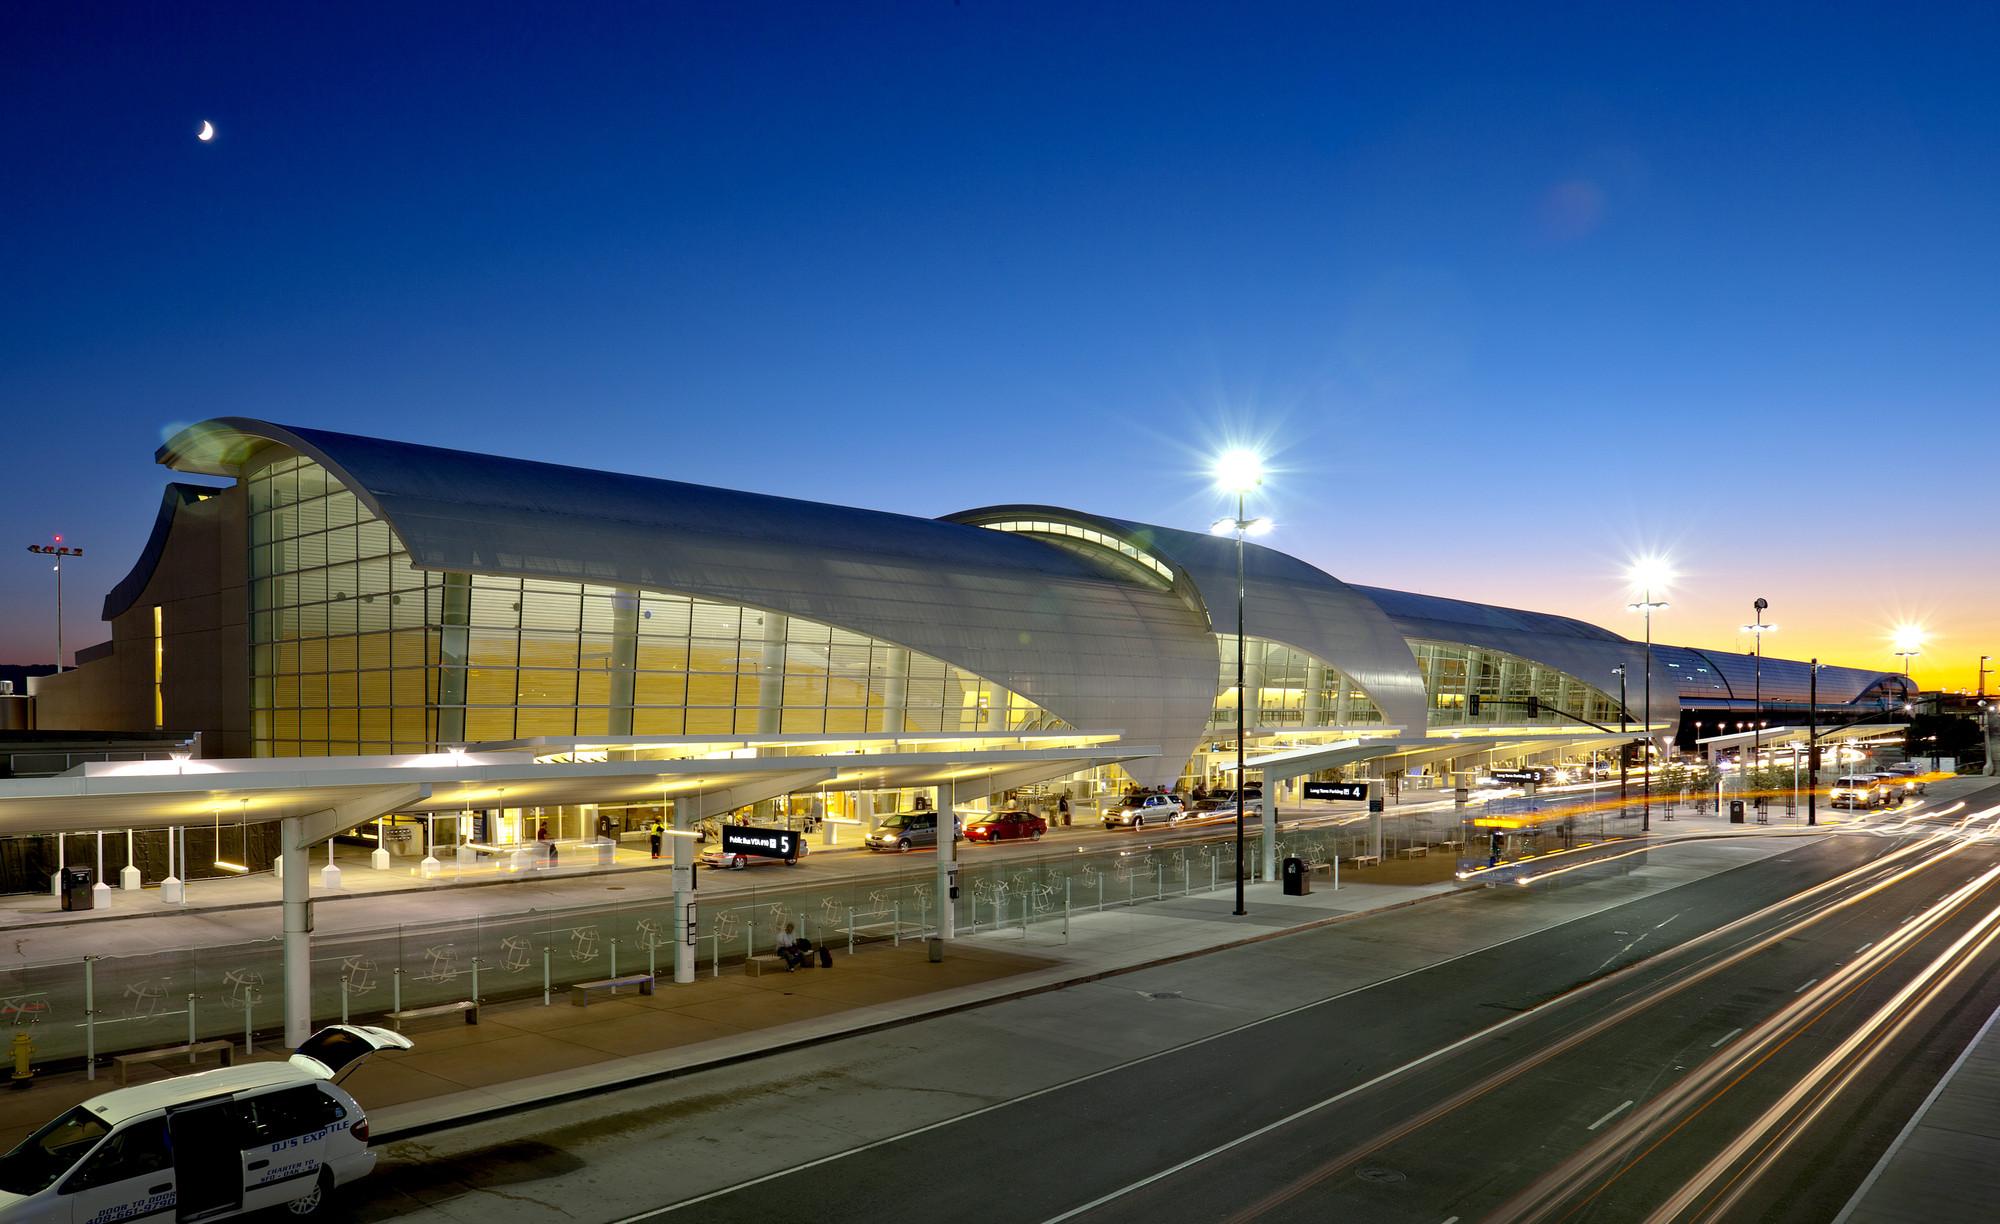 Niagara Falls At Night Wallpaper Gallery Of Norman Y Mineta San Jose International Airport